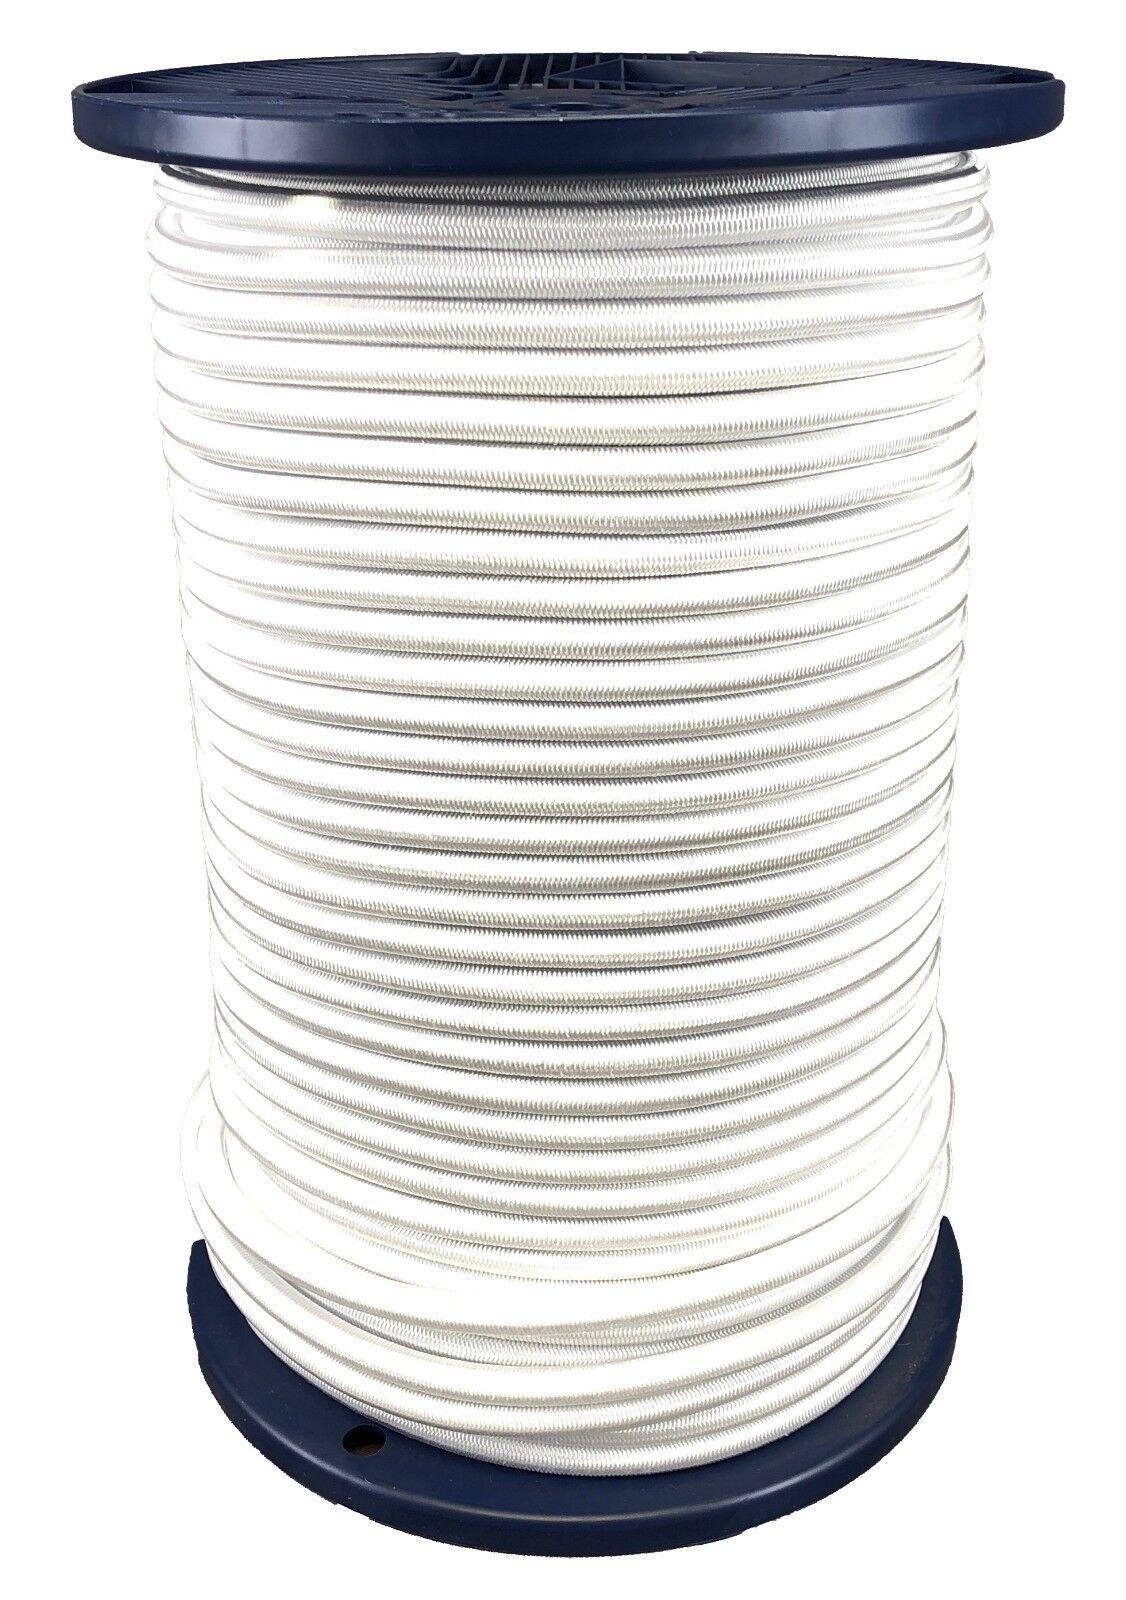 12mm wit Elastic Bungee Rope x 35 Metres Shock Cord Binden Down